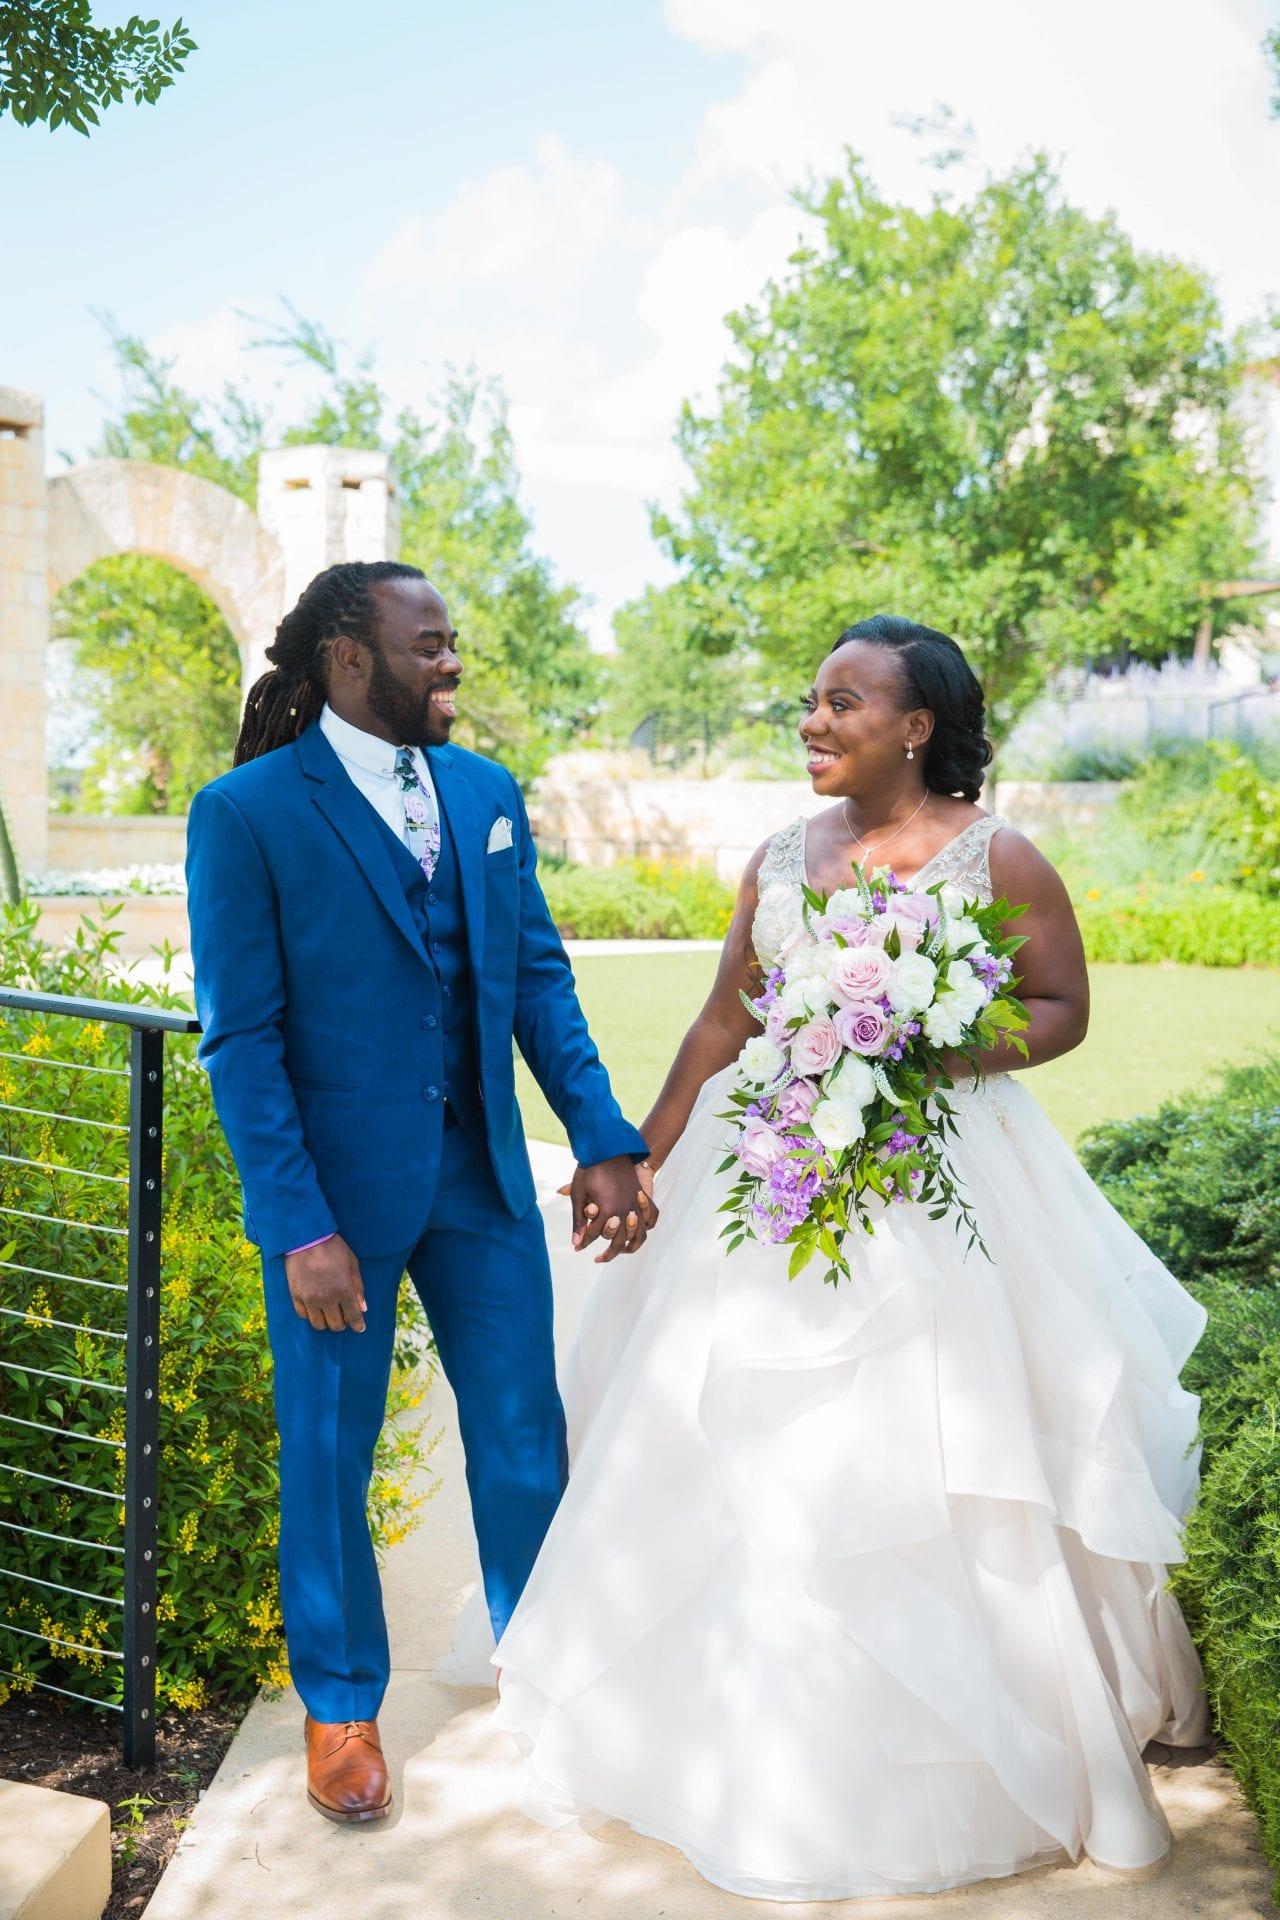 Onyema wedding La Cantera first look excitement